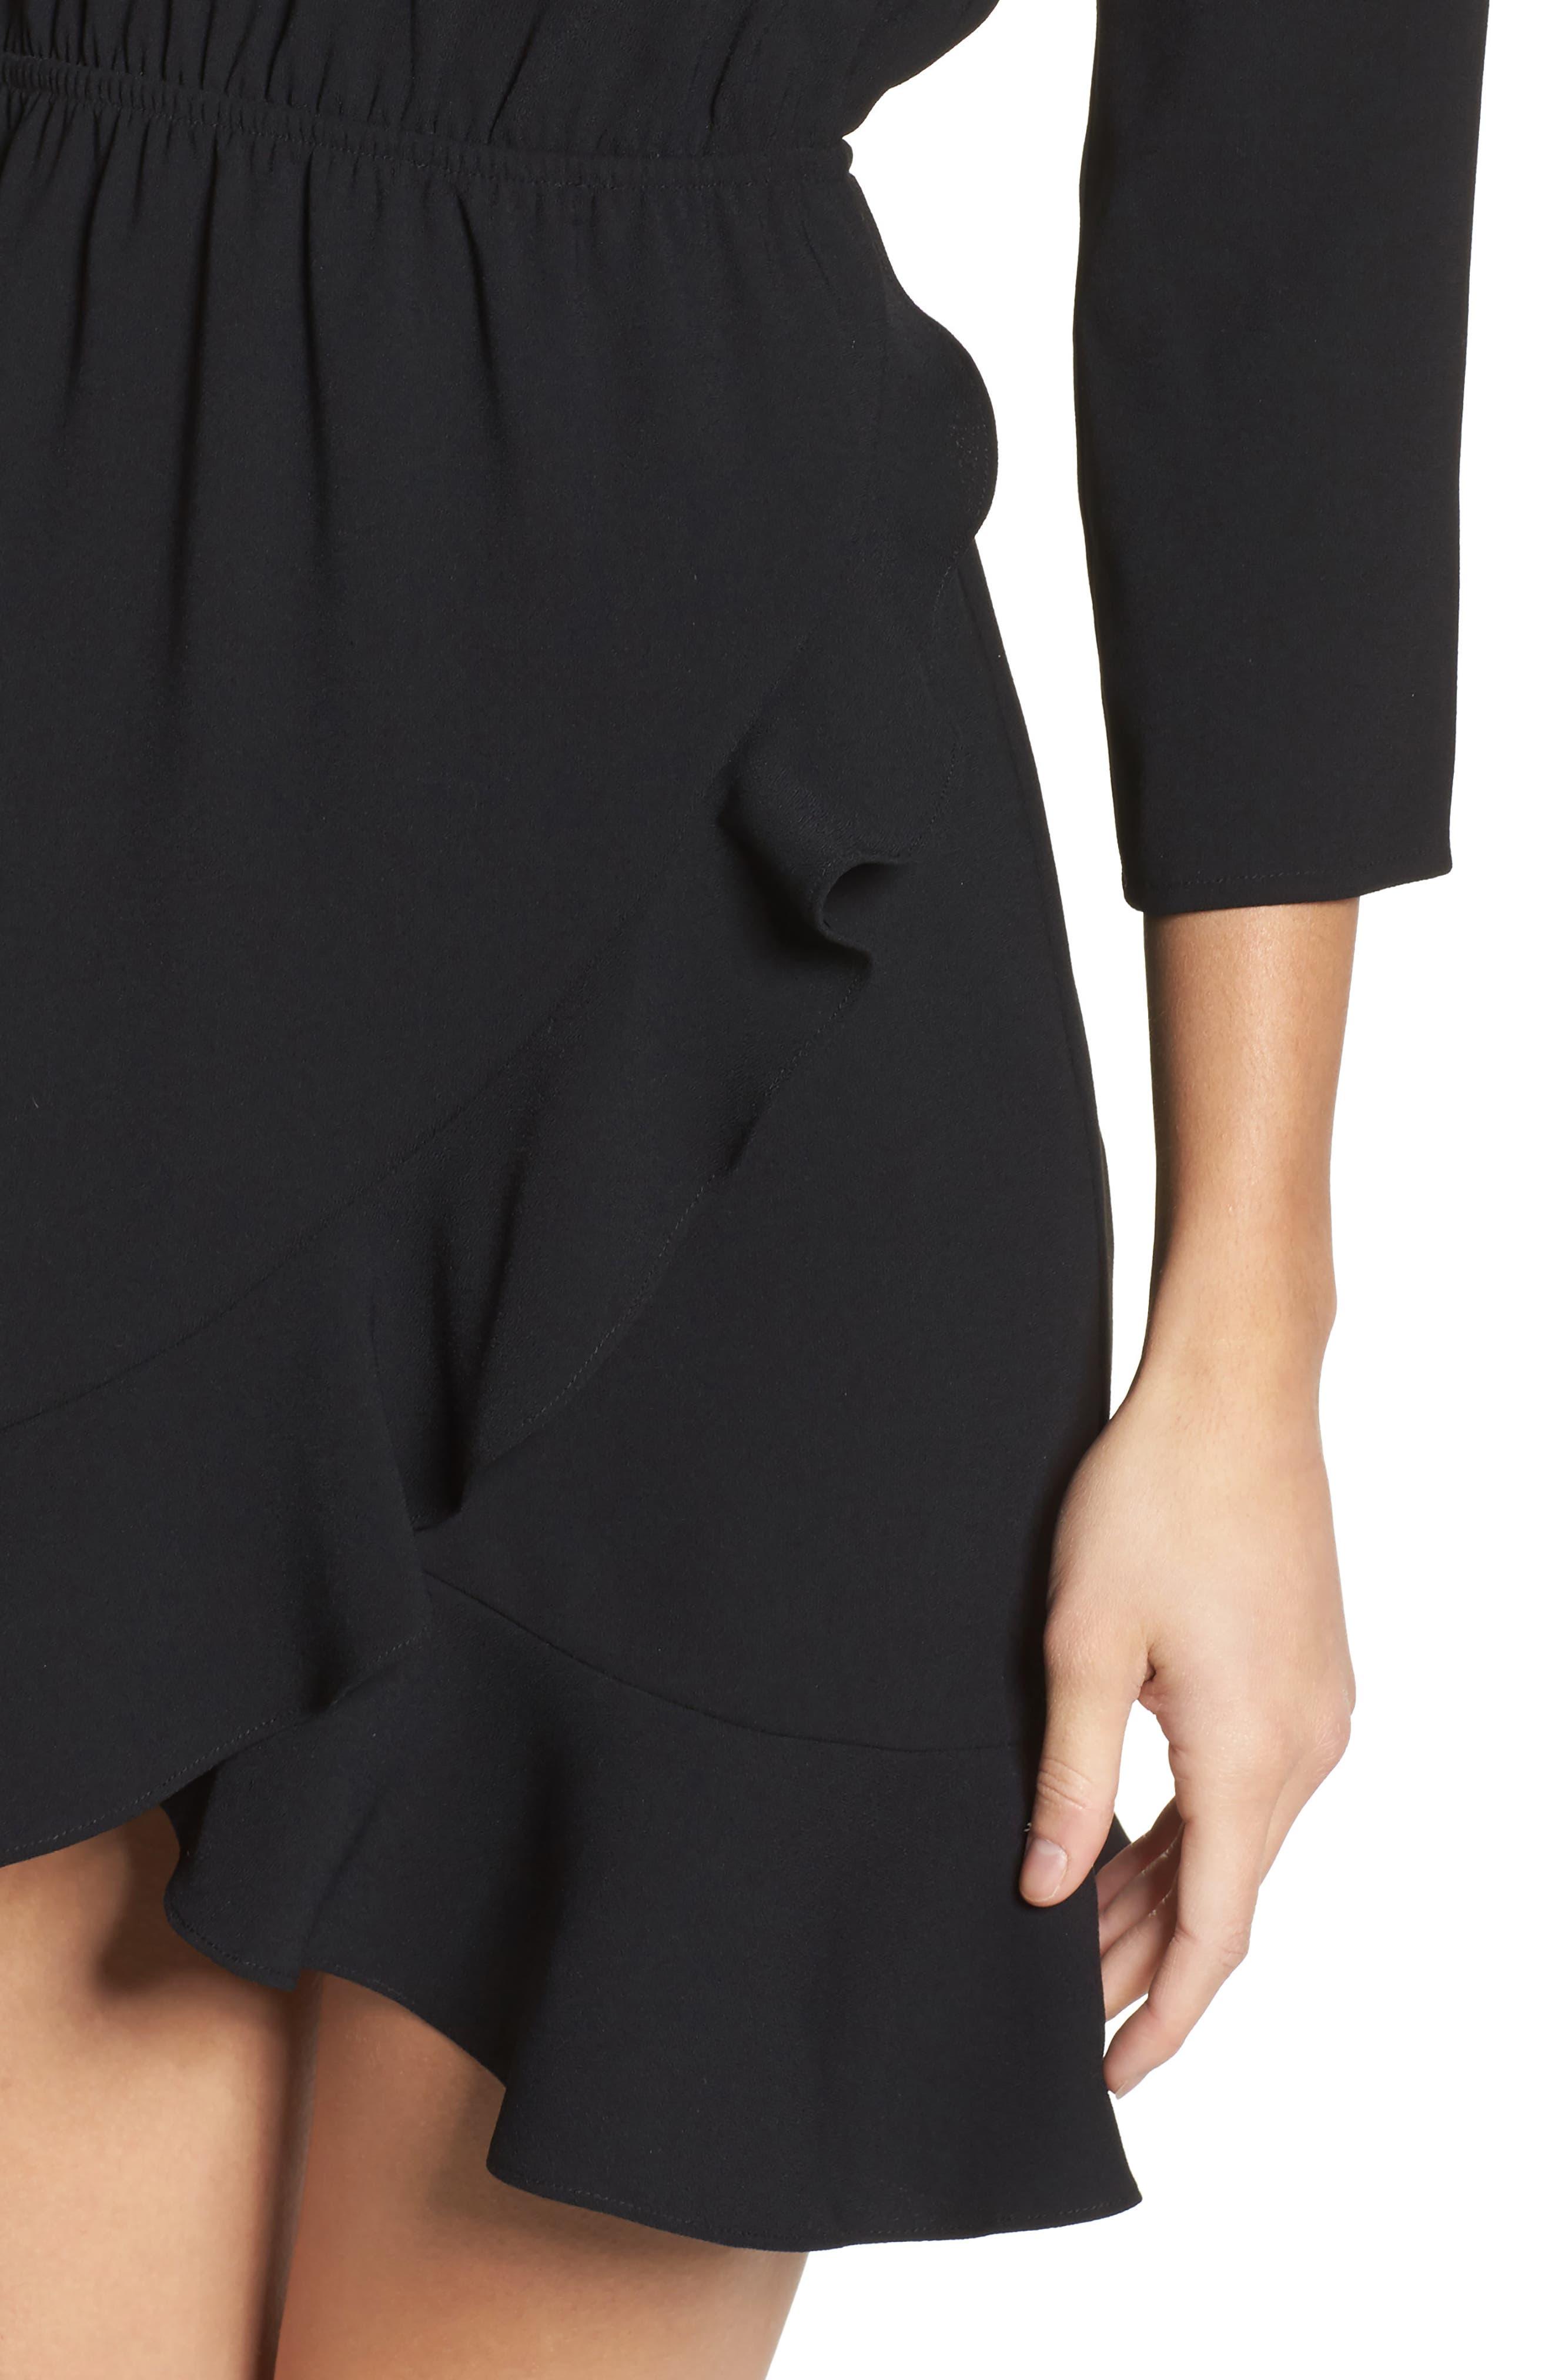 St Germain Ruffle Fit & Flare Dress,                             Alternate thumbnail 7, color,